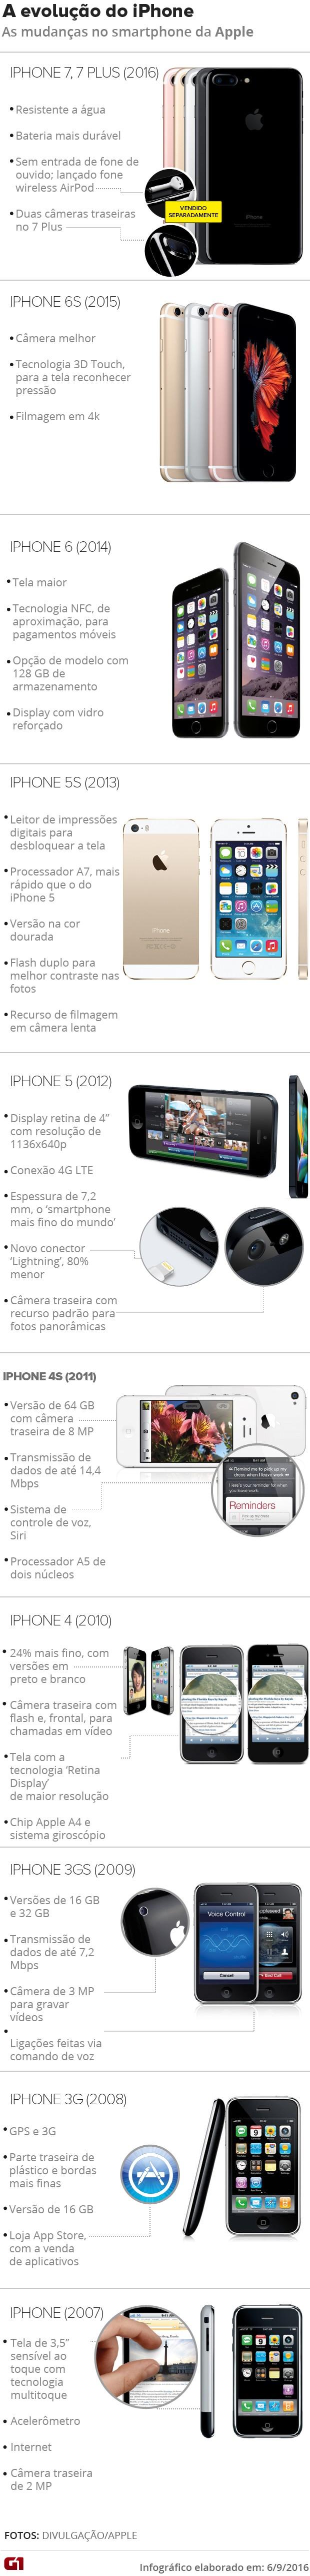 arte iphone 7 (Foto: arte)